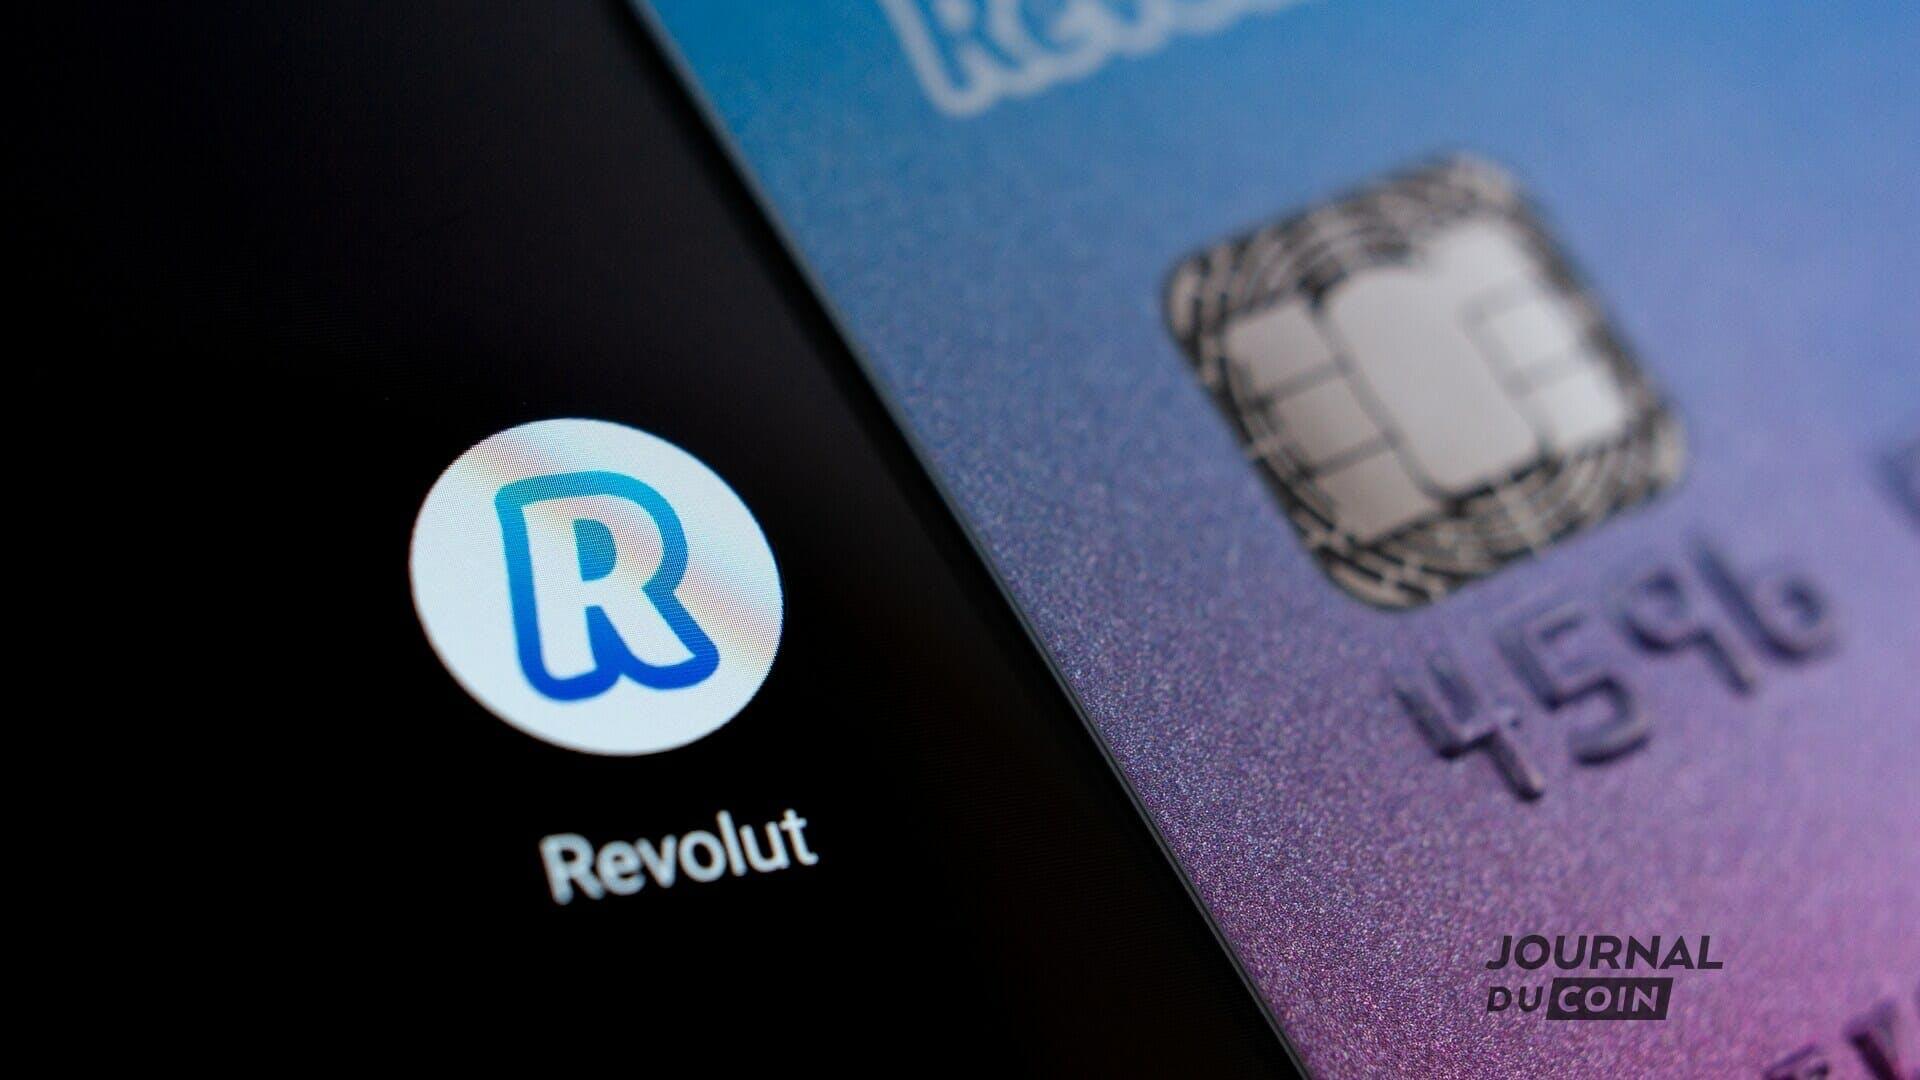 Revolut Becomes Most Valuable UK Start-Up After $33bn Valuation